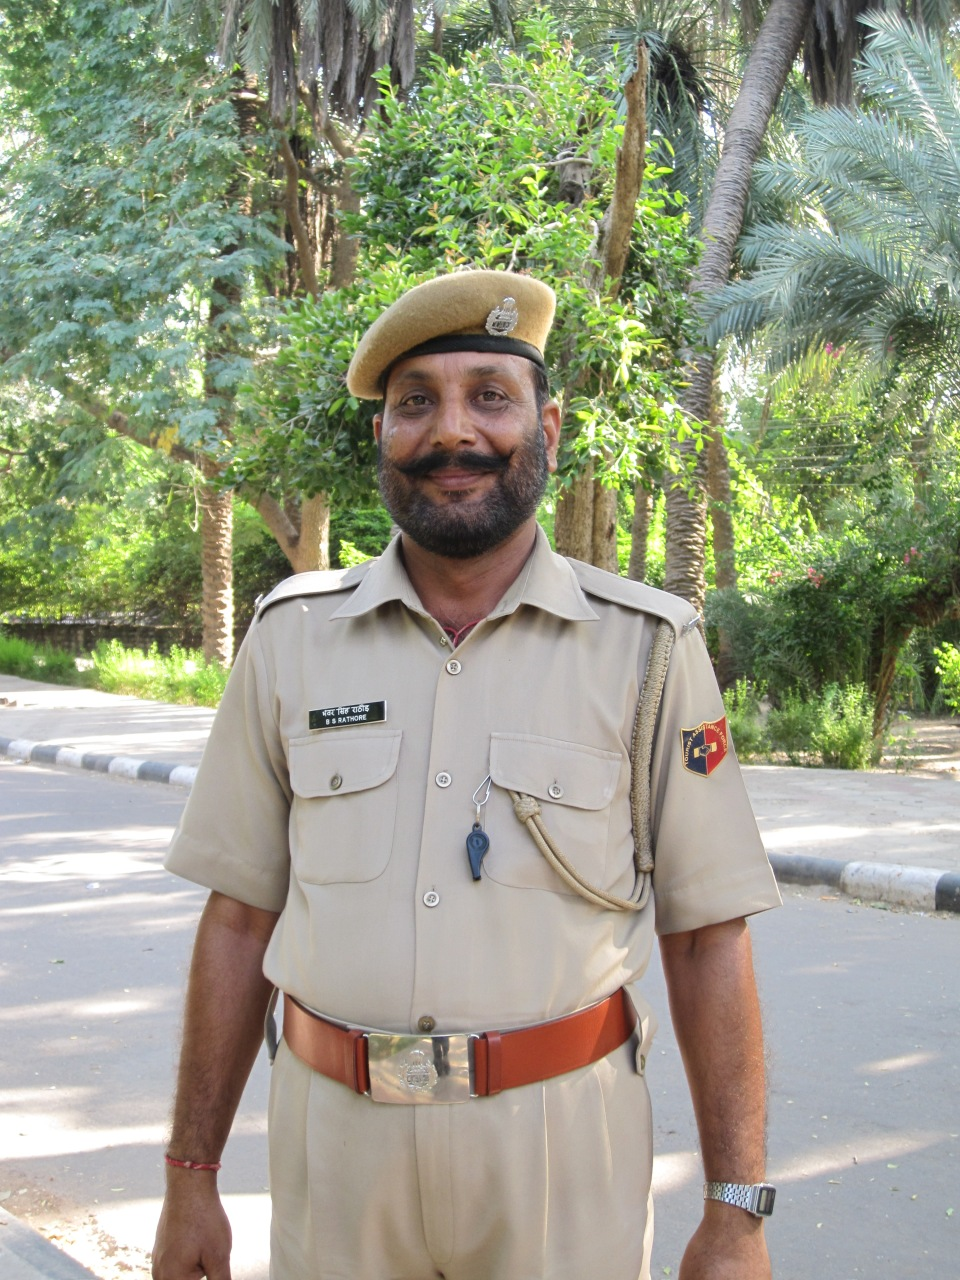 Polizist im Park